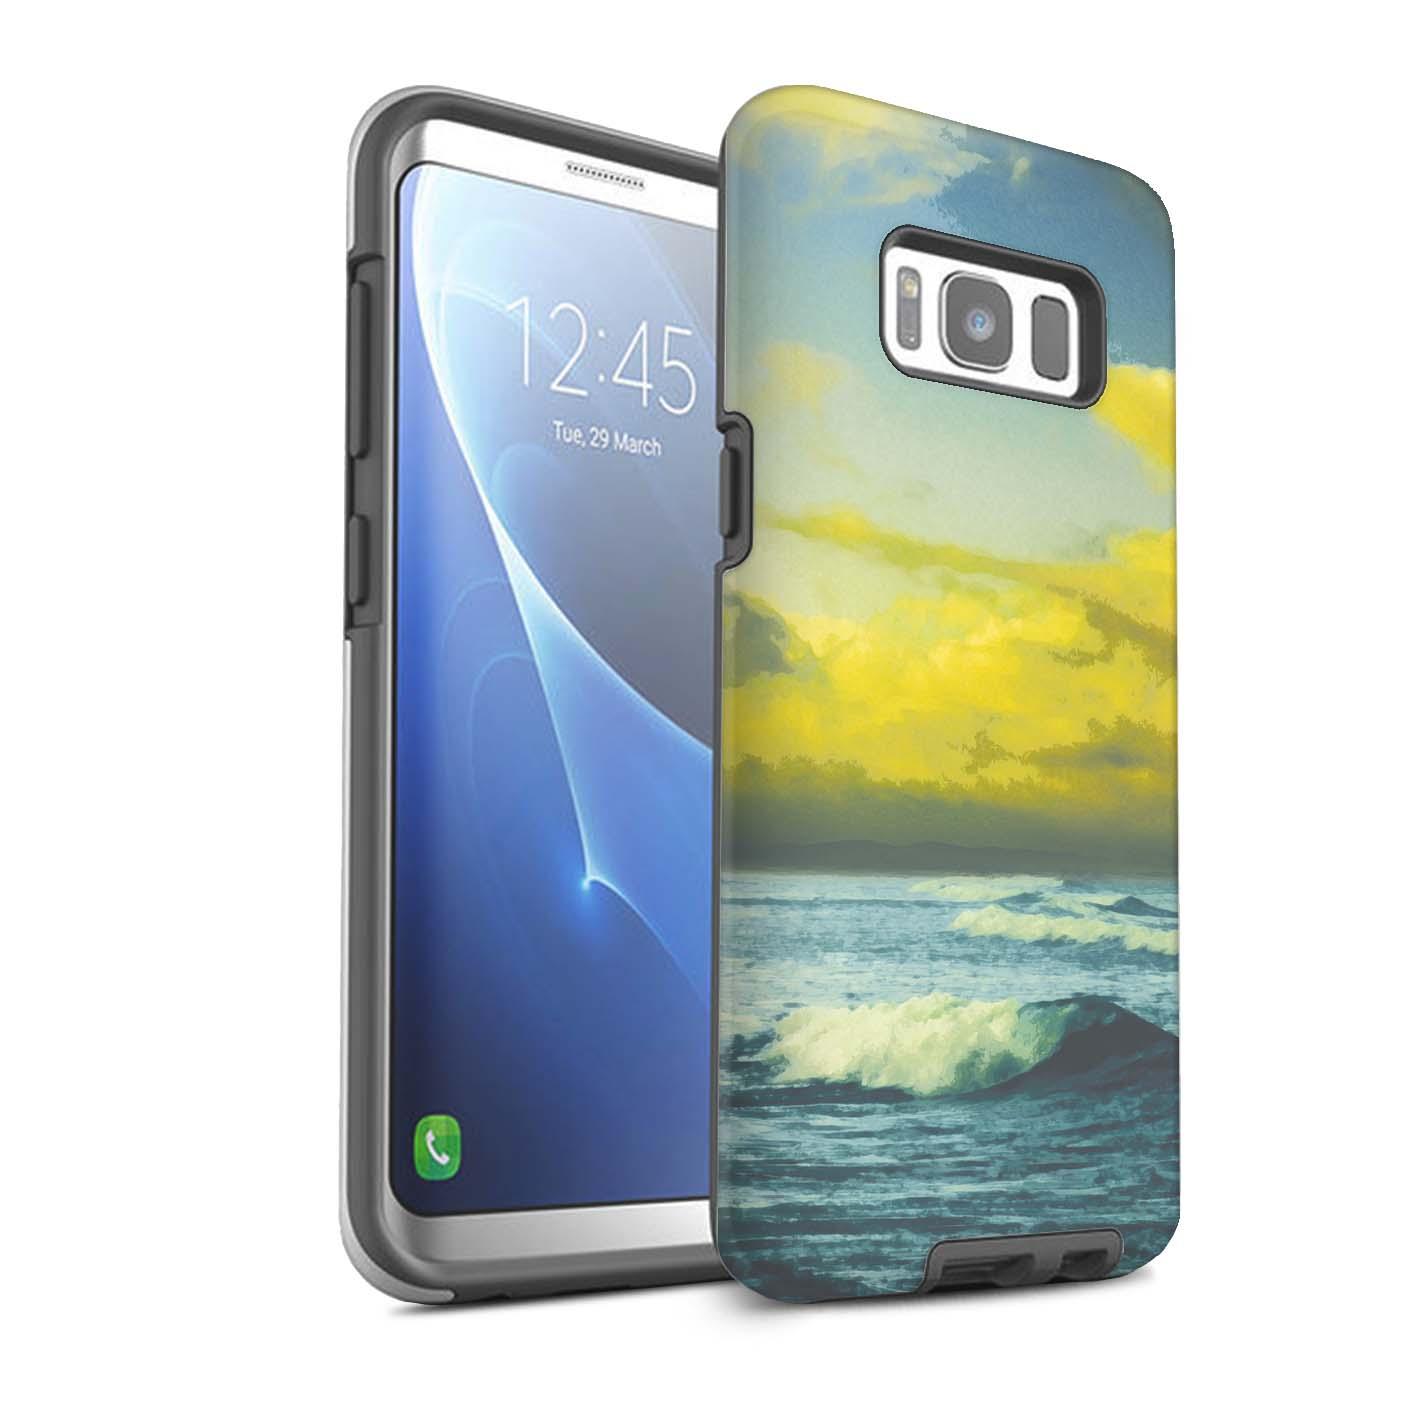 Robuste-Matte-Antichoc-Etui-STUFF4-pour-Samsung-Galaxy-S8-G950-Beau-Monde-Art